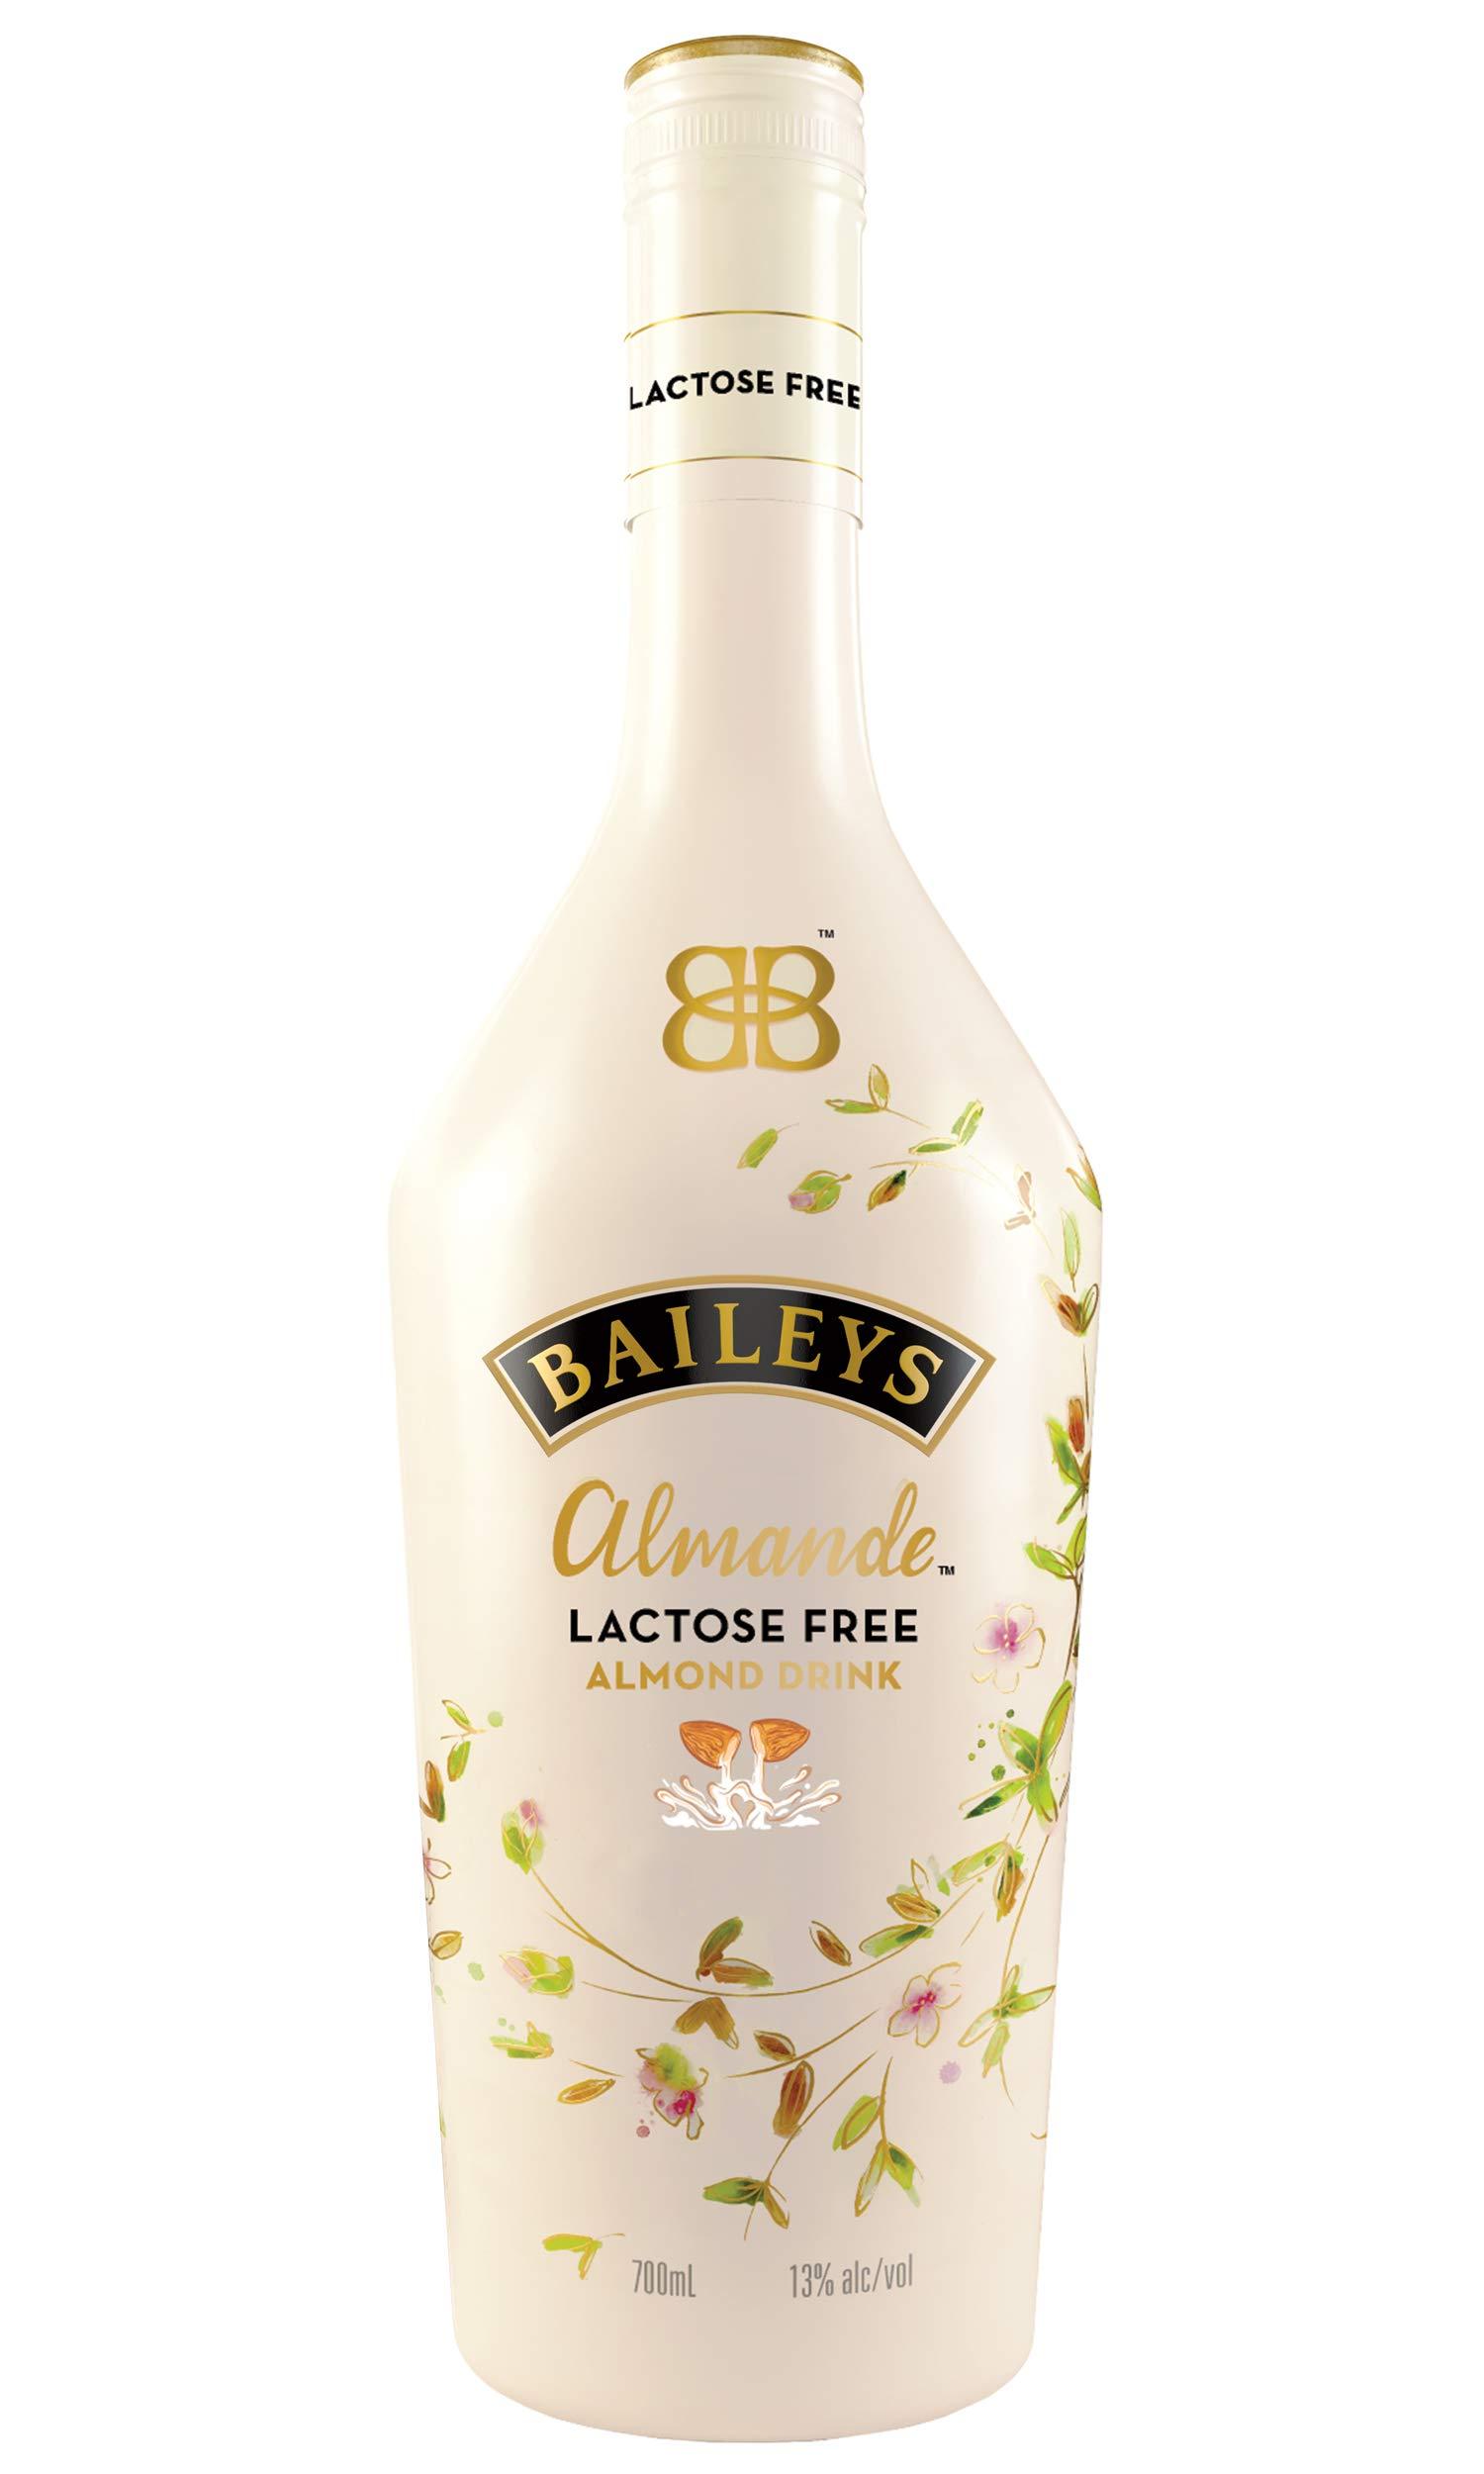 Baileys-almonde